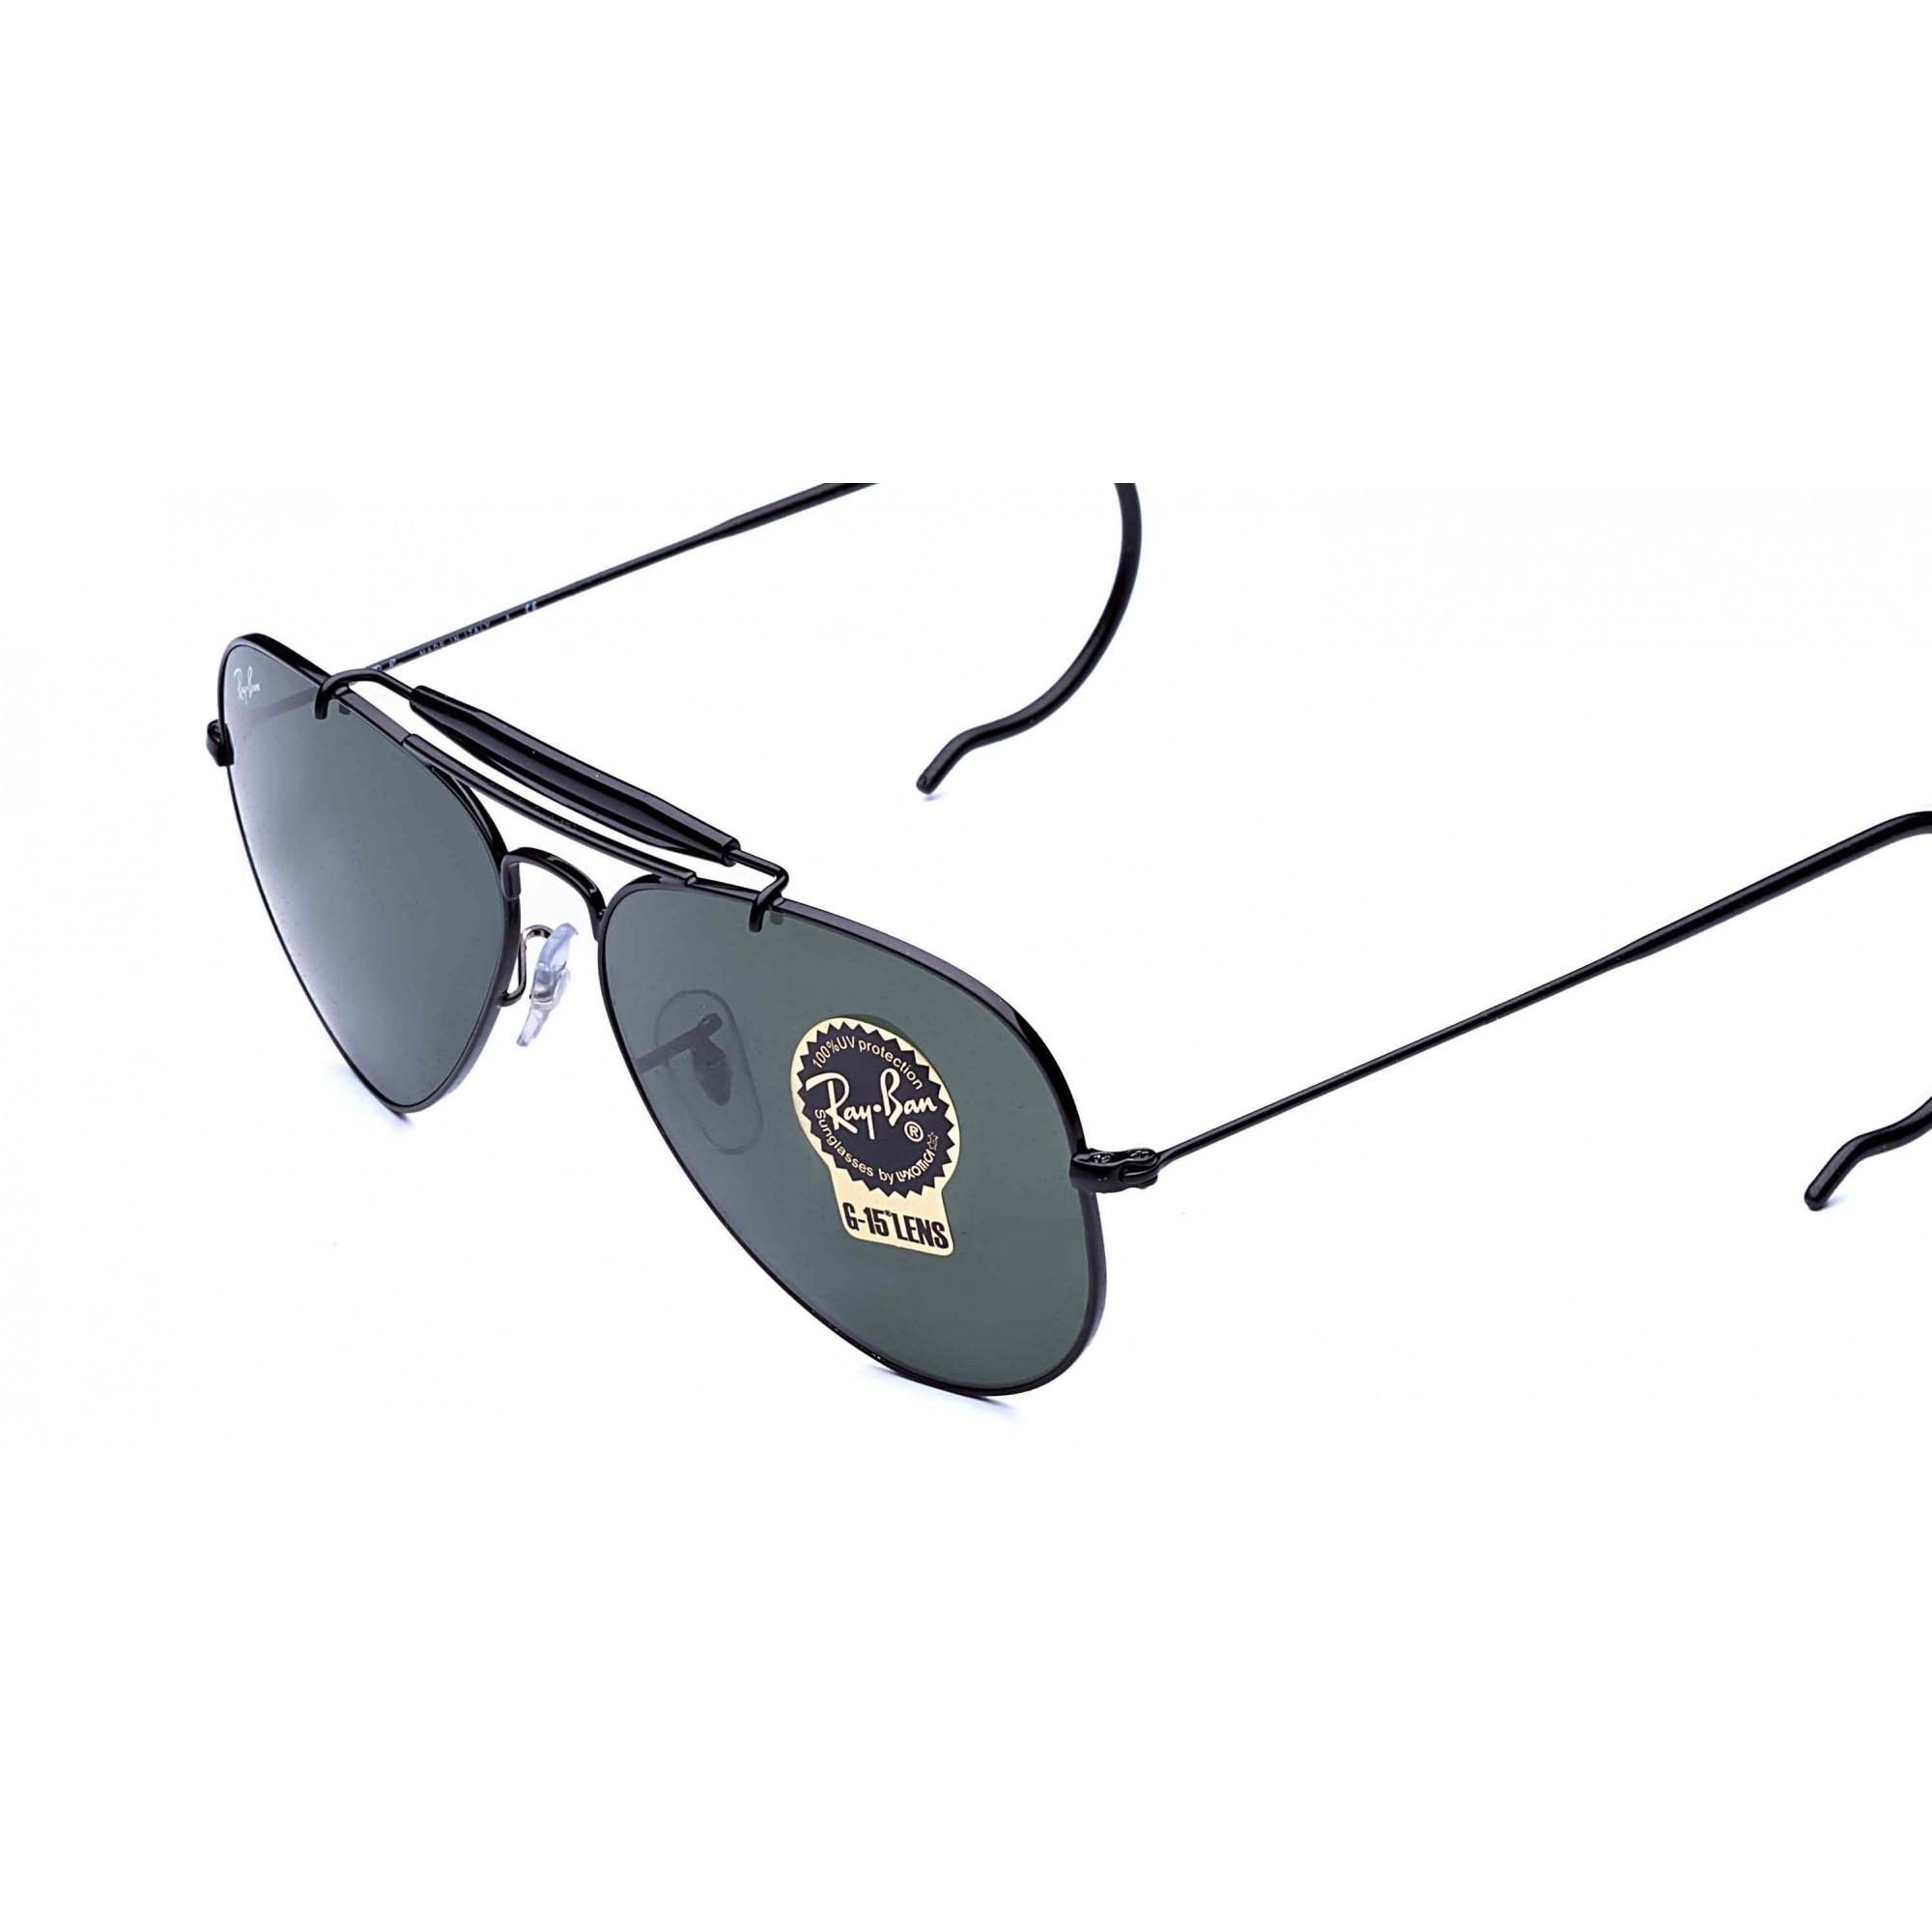 Óculos de Sol Outdoorsman + Lente Solar com Grau